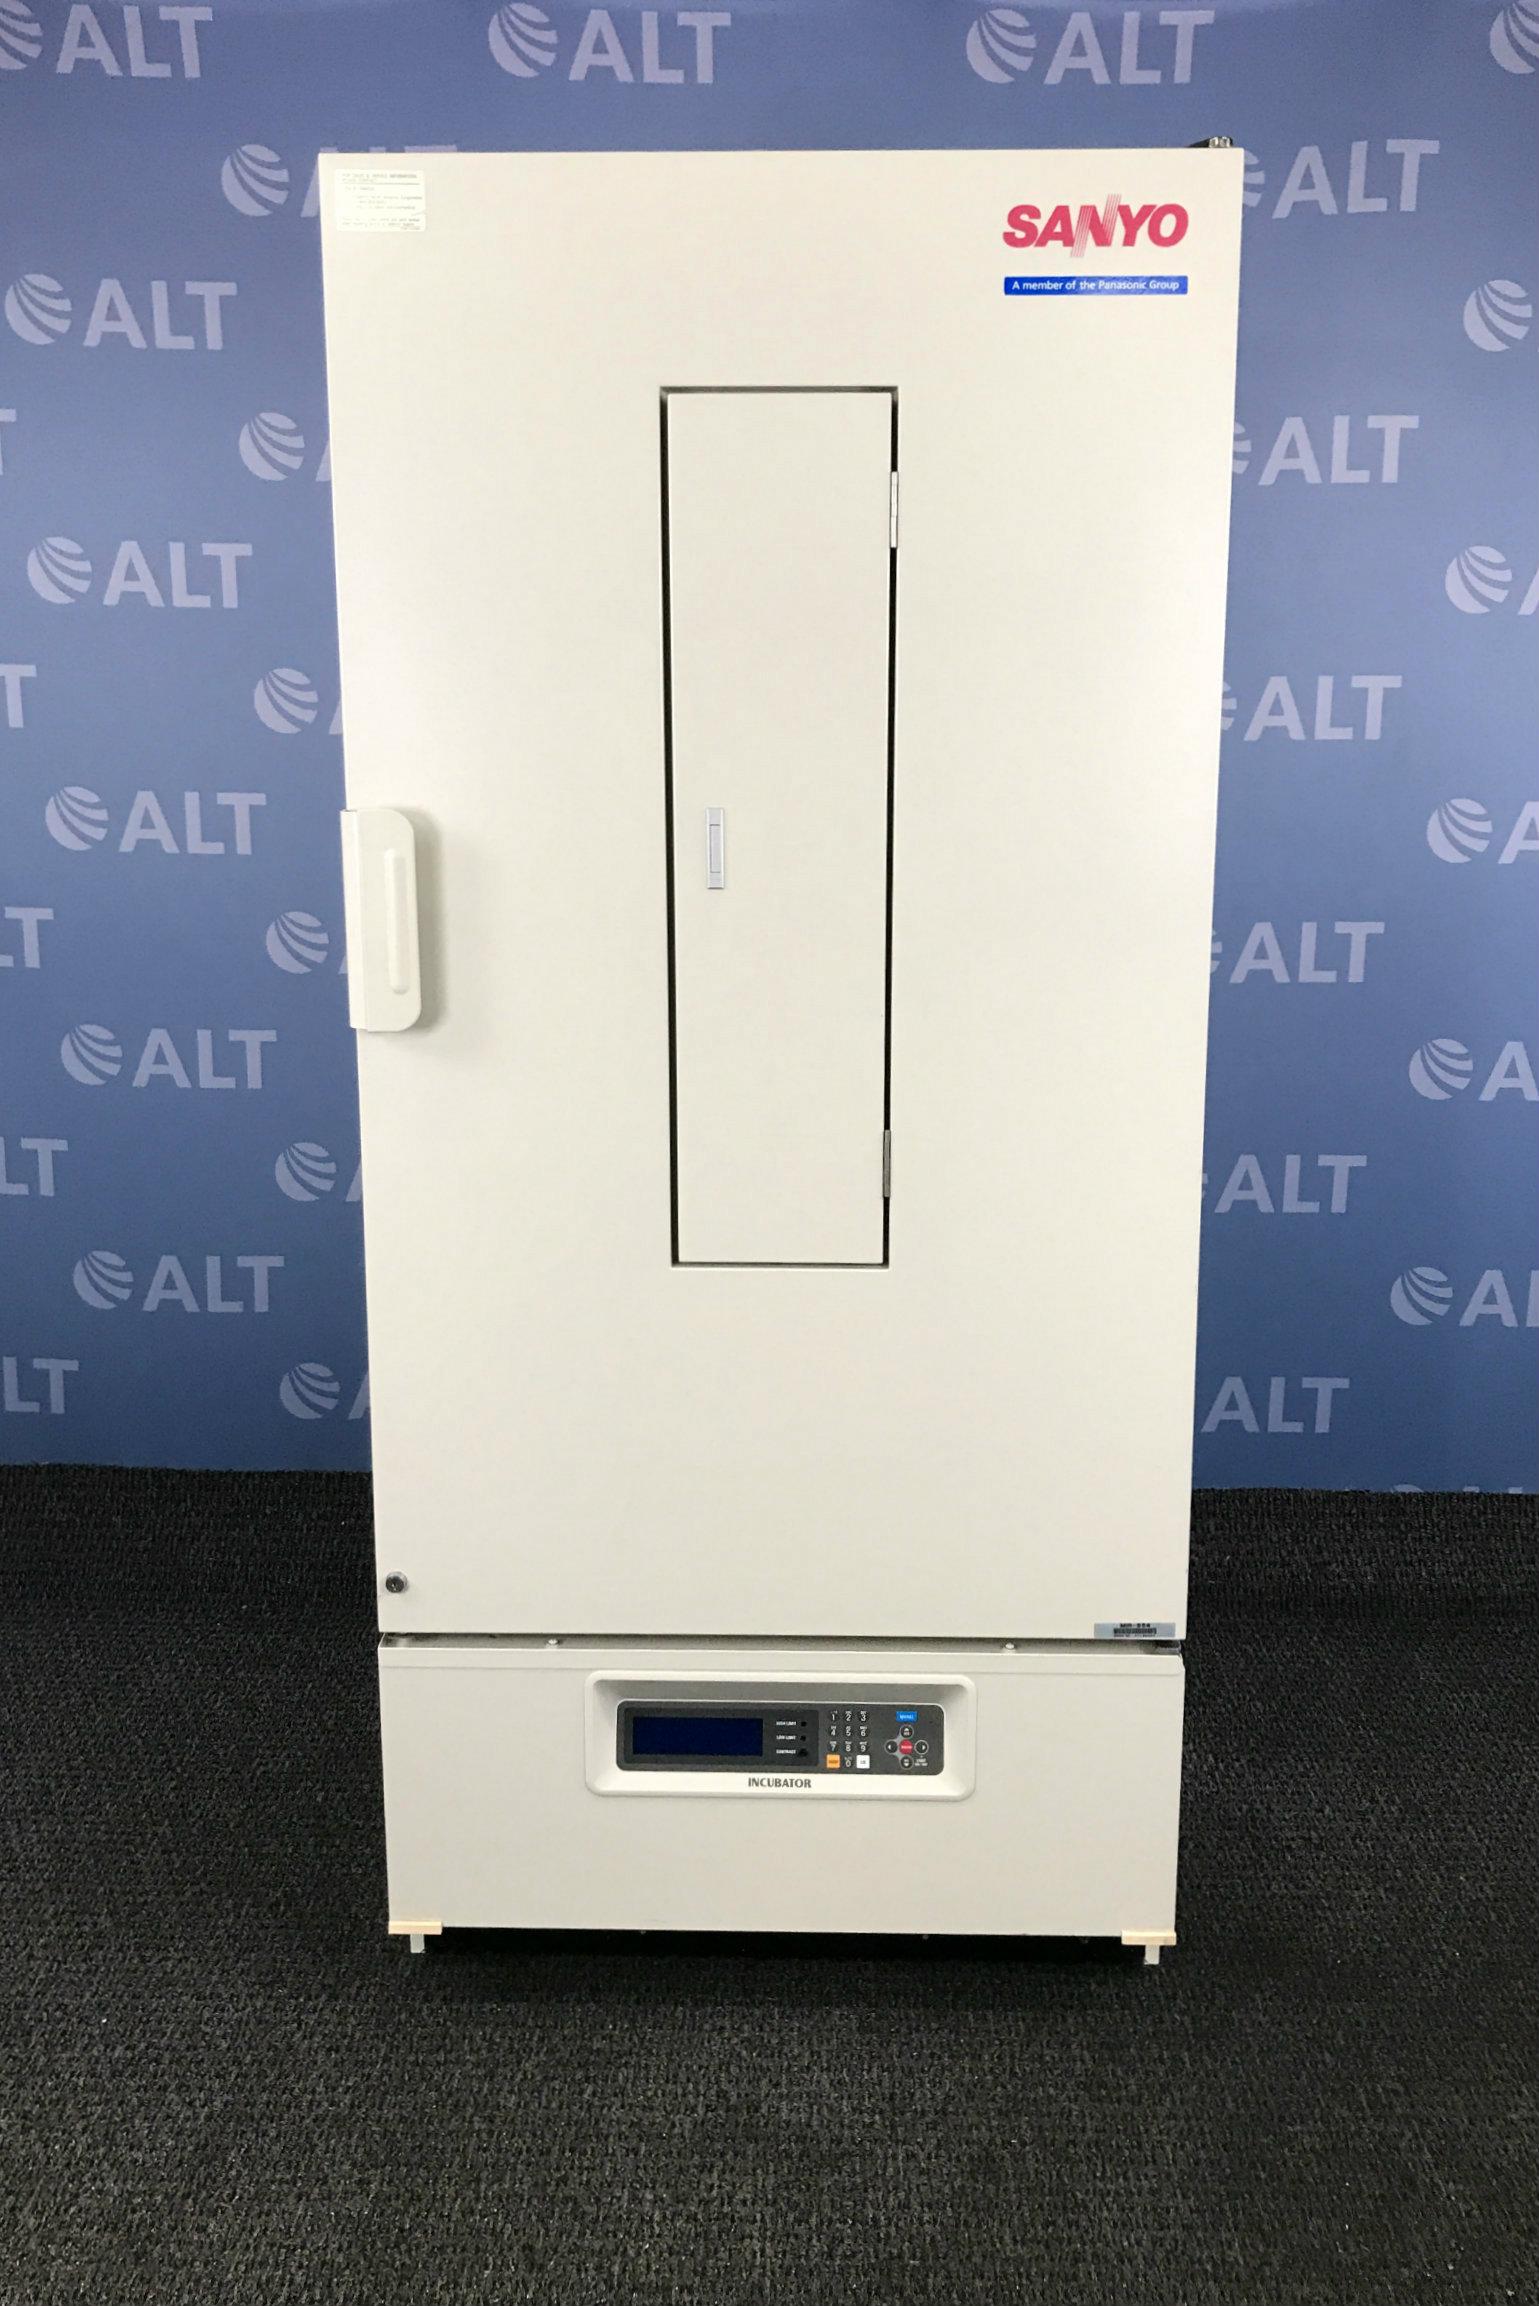 Sanyo MIR-554 Cooled Incubator Image